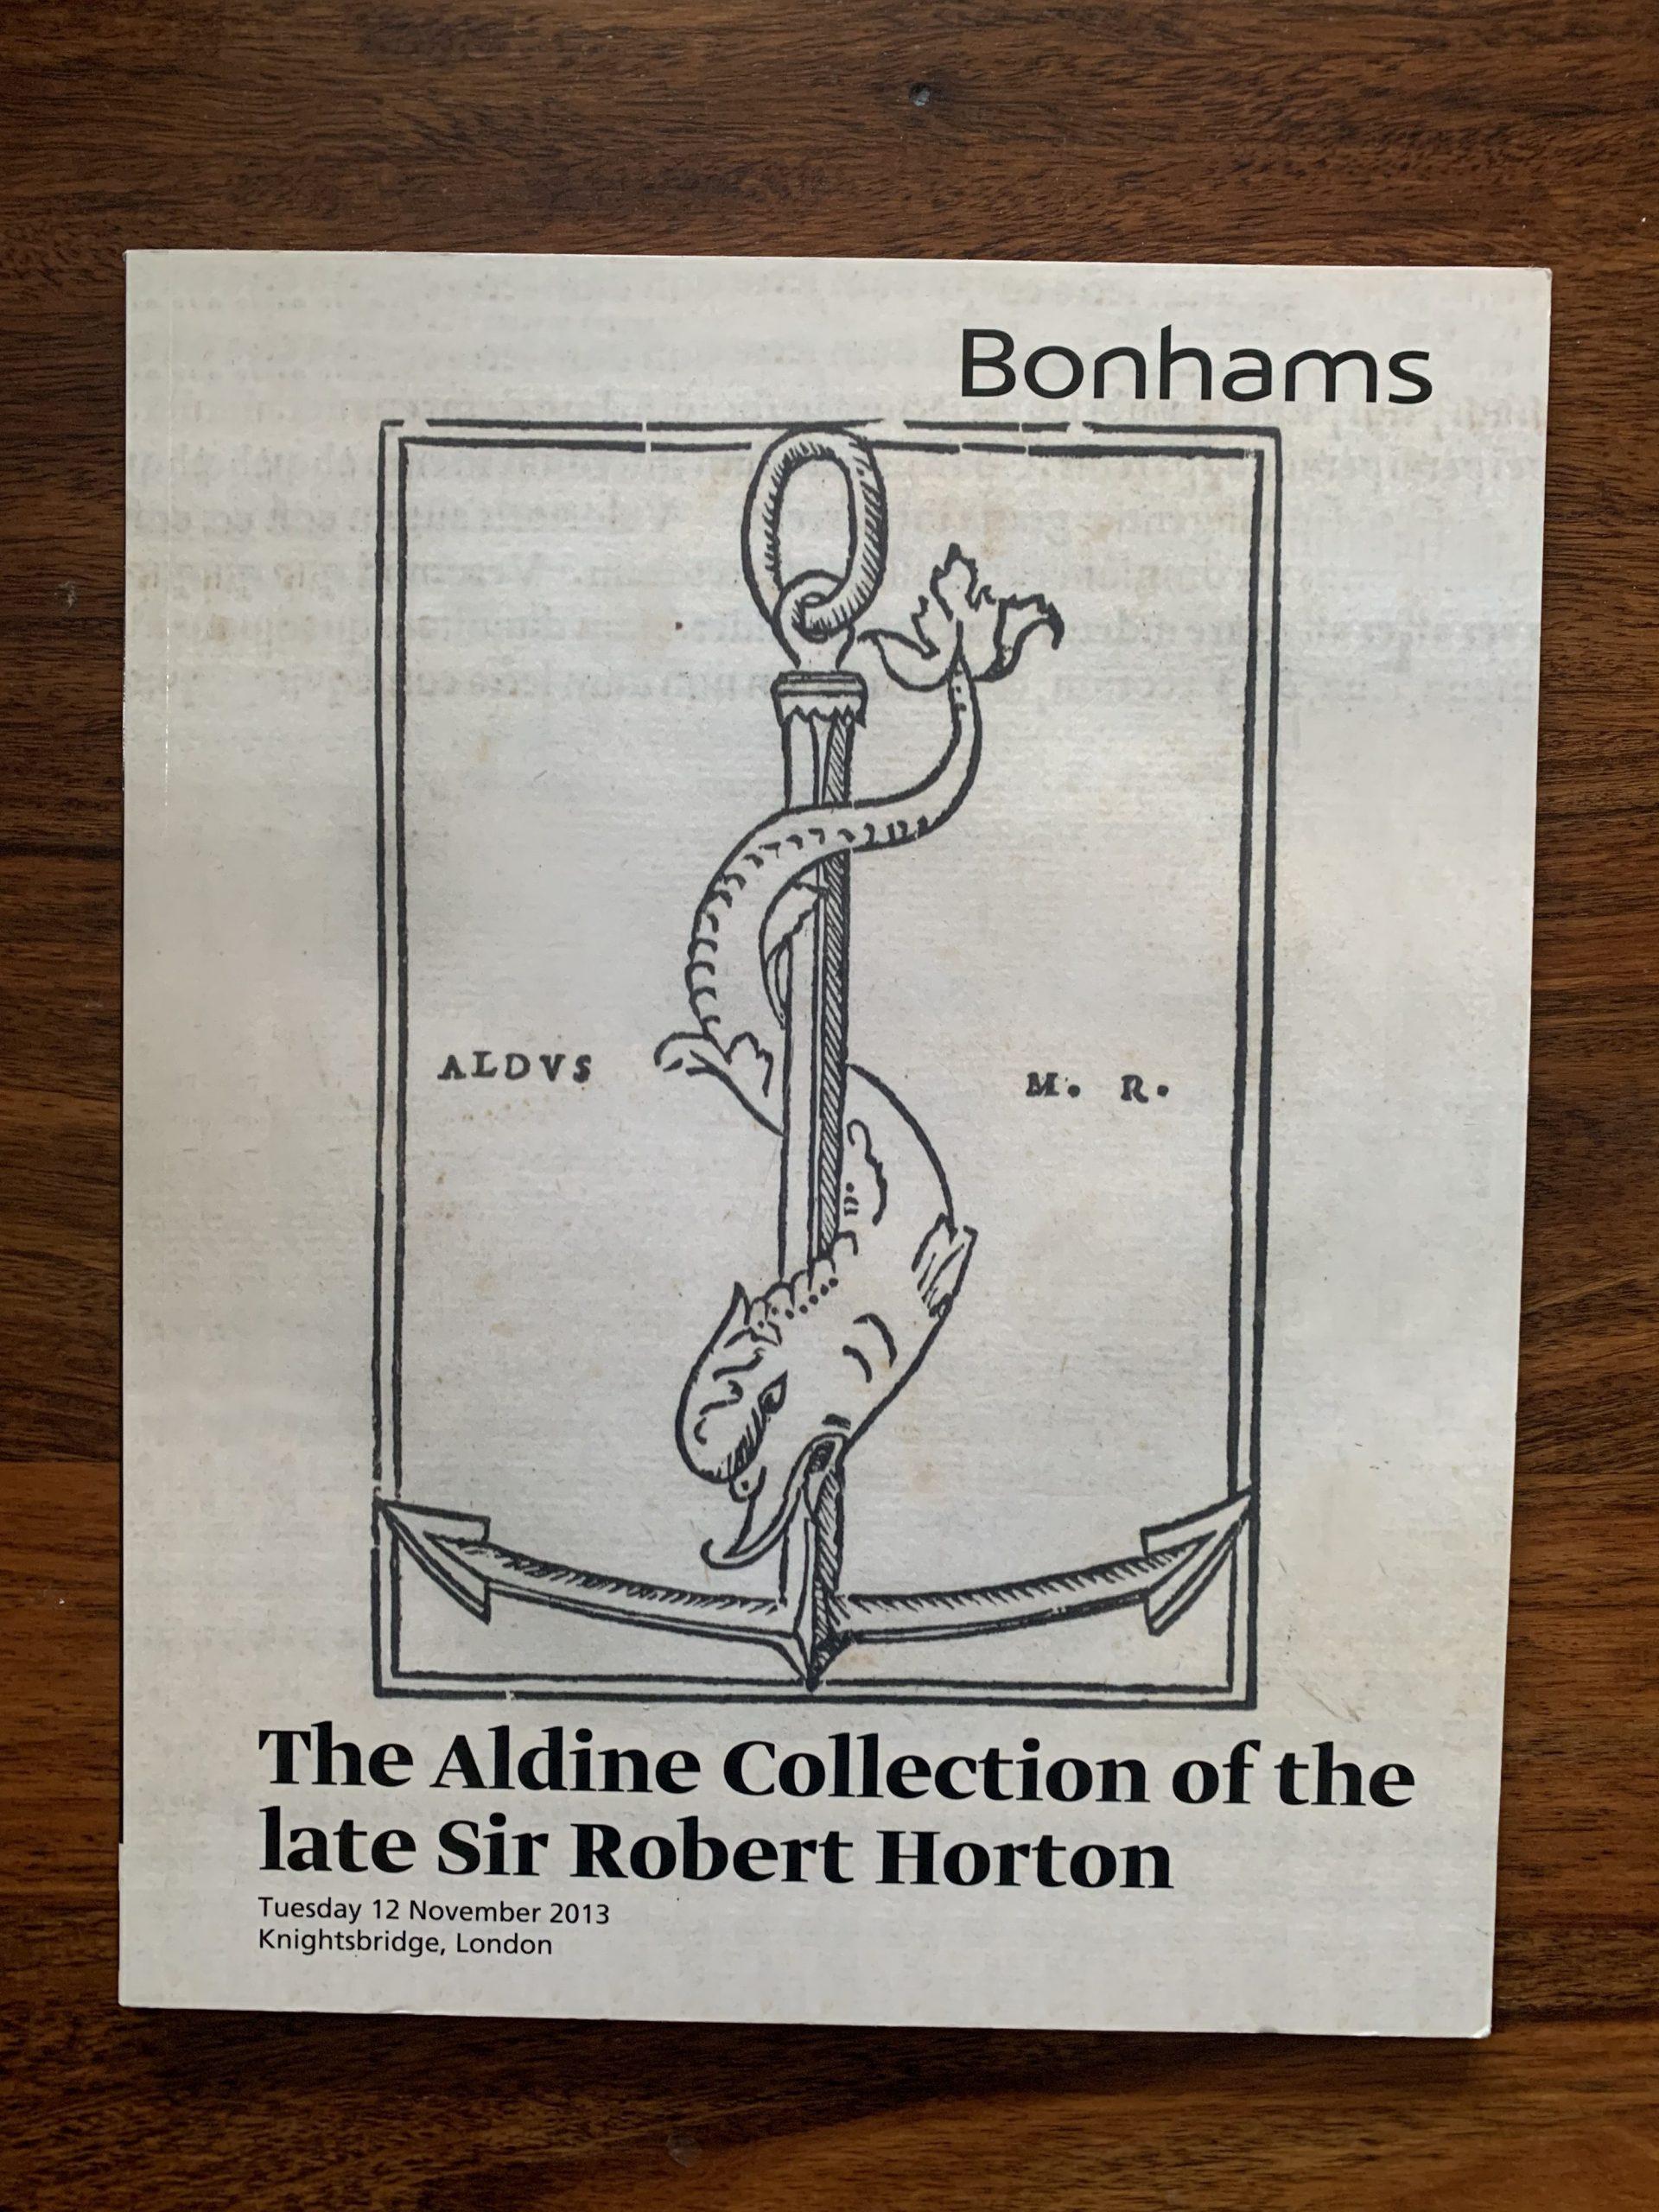 Bonhams. The Aldine Collection of the Late Sir Robert Horton